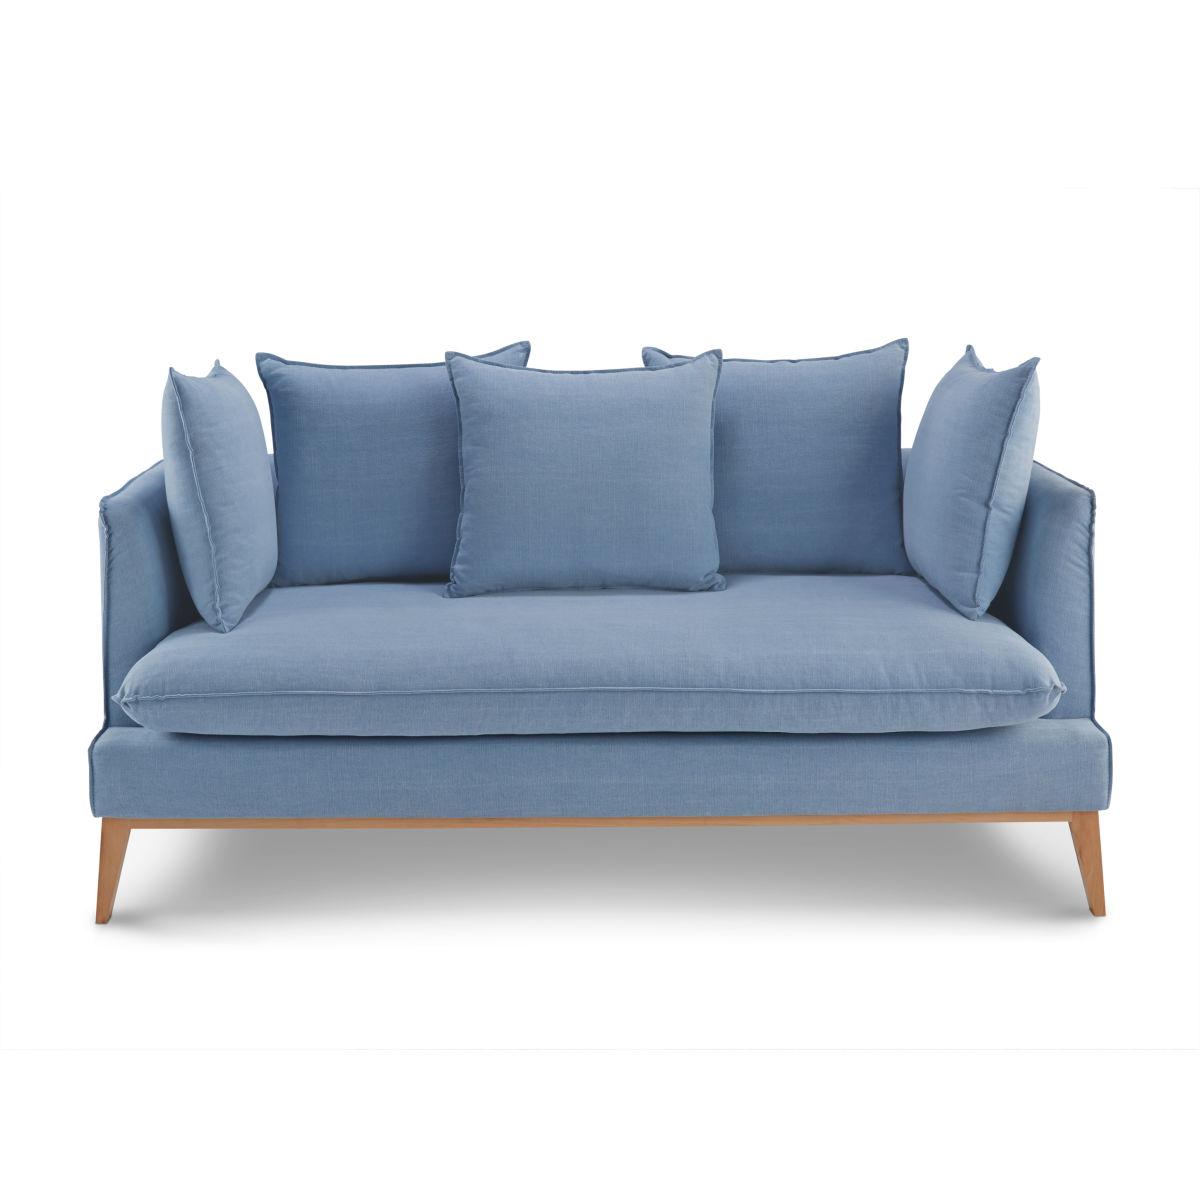 Vintage Sofa Retro Couch Puro Moebeldealcom